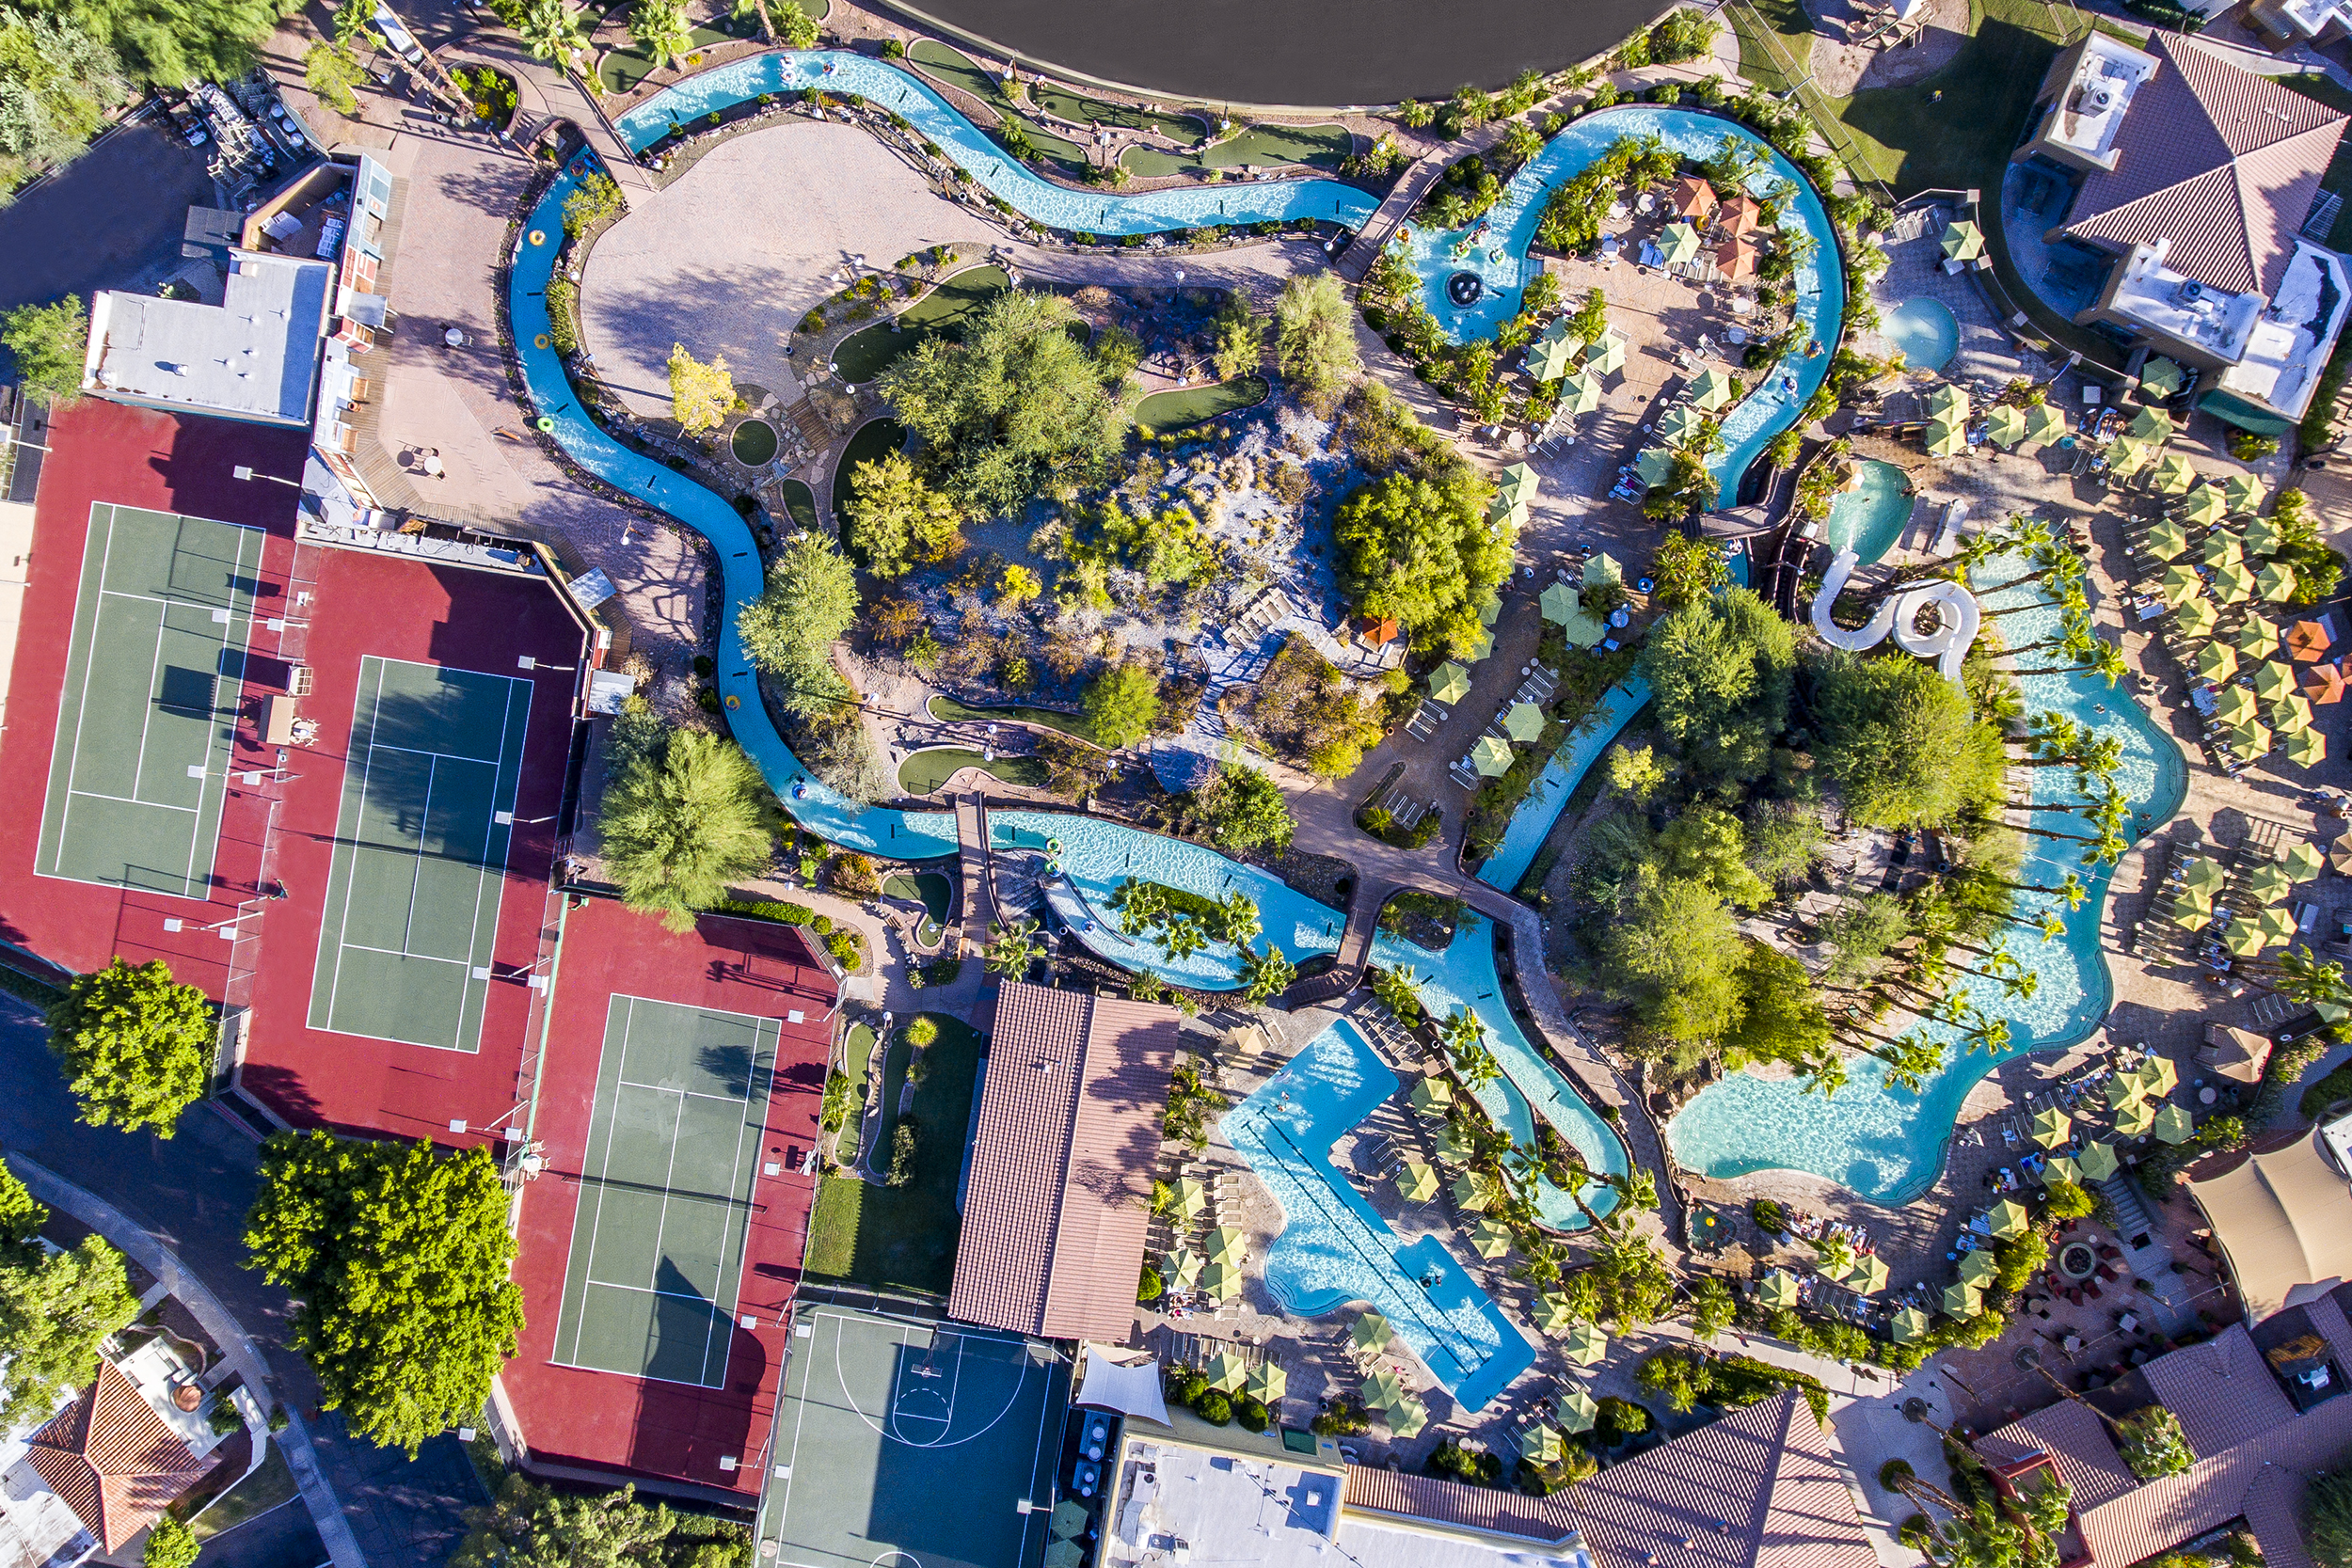 21_Aerial River Ranch3.jpg